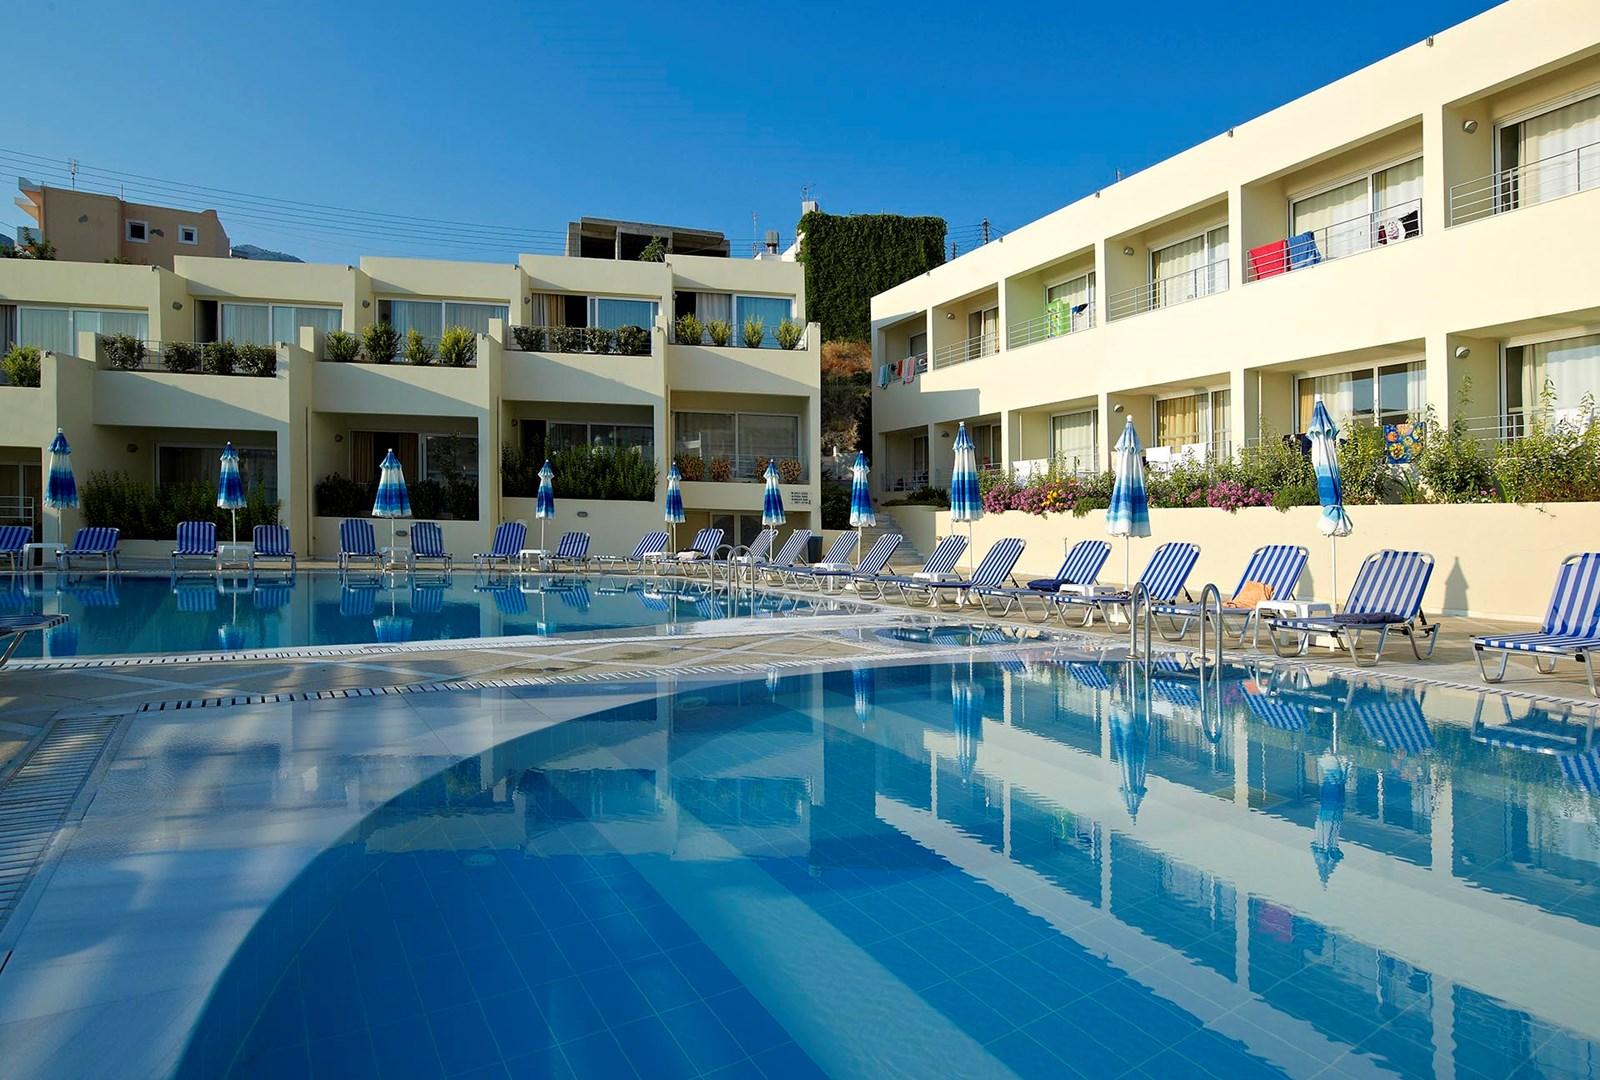 bali beach village hotel rethymno crete. Black Bedroom Furniture Sets. Home Design Ideas